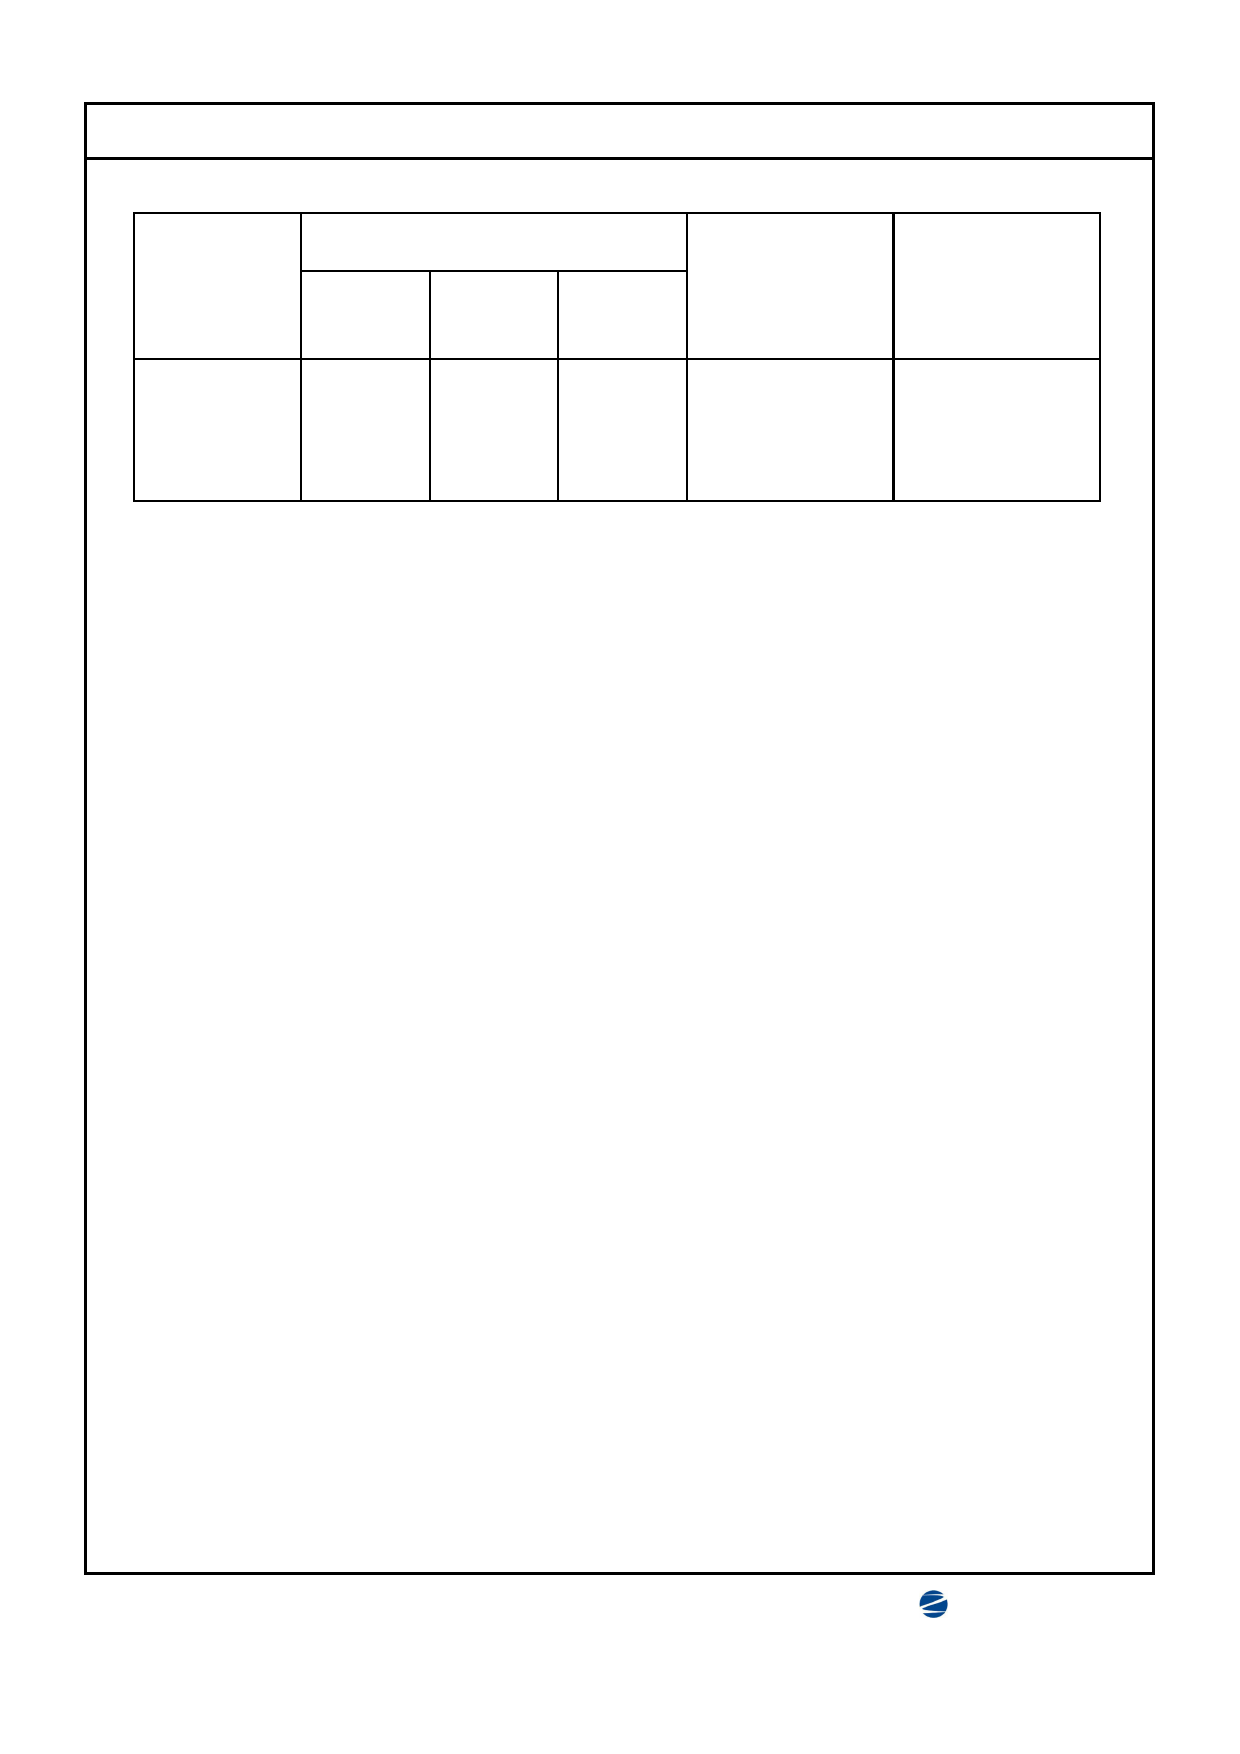 MBR10200CFSH pdf, ピン配列